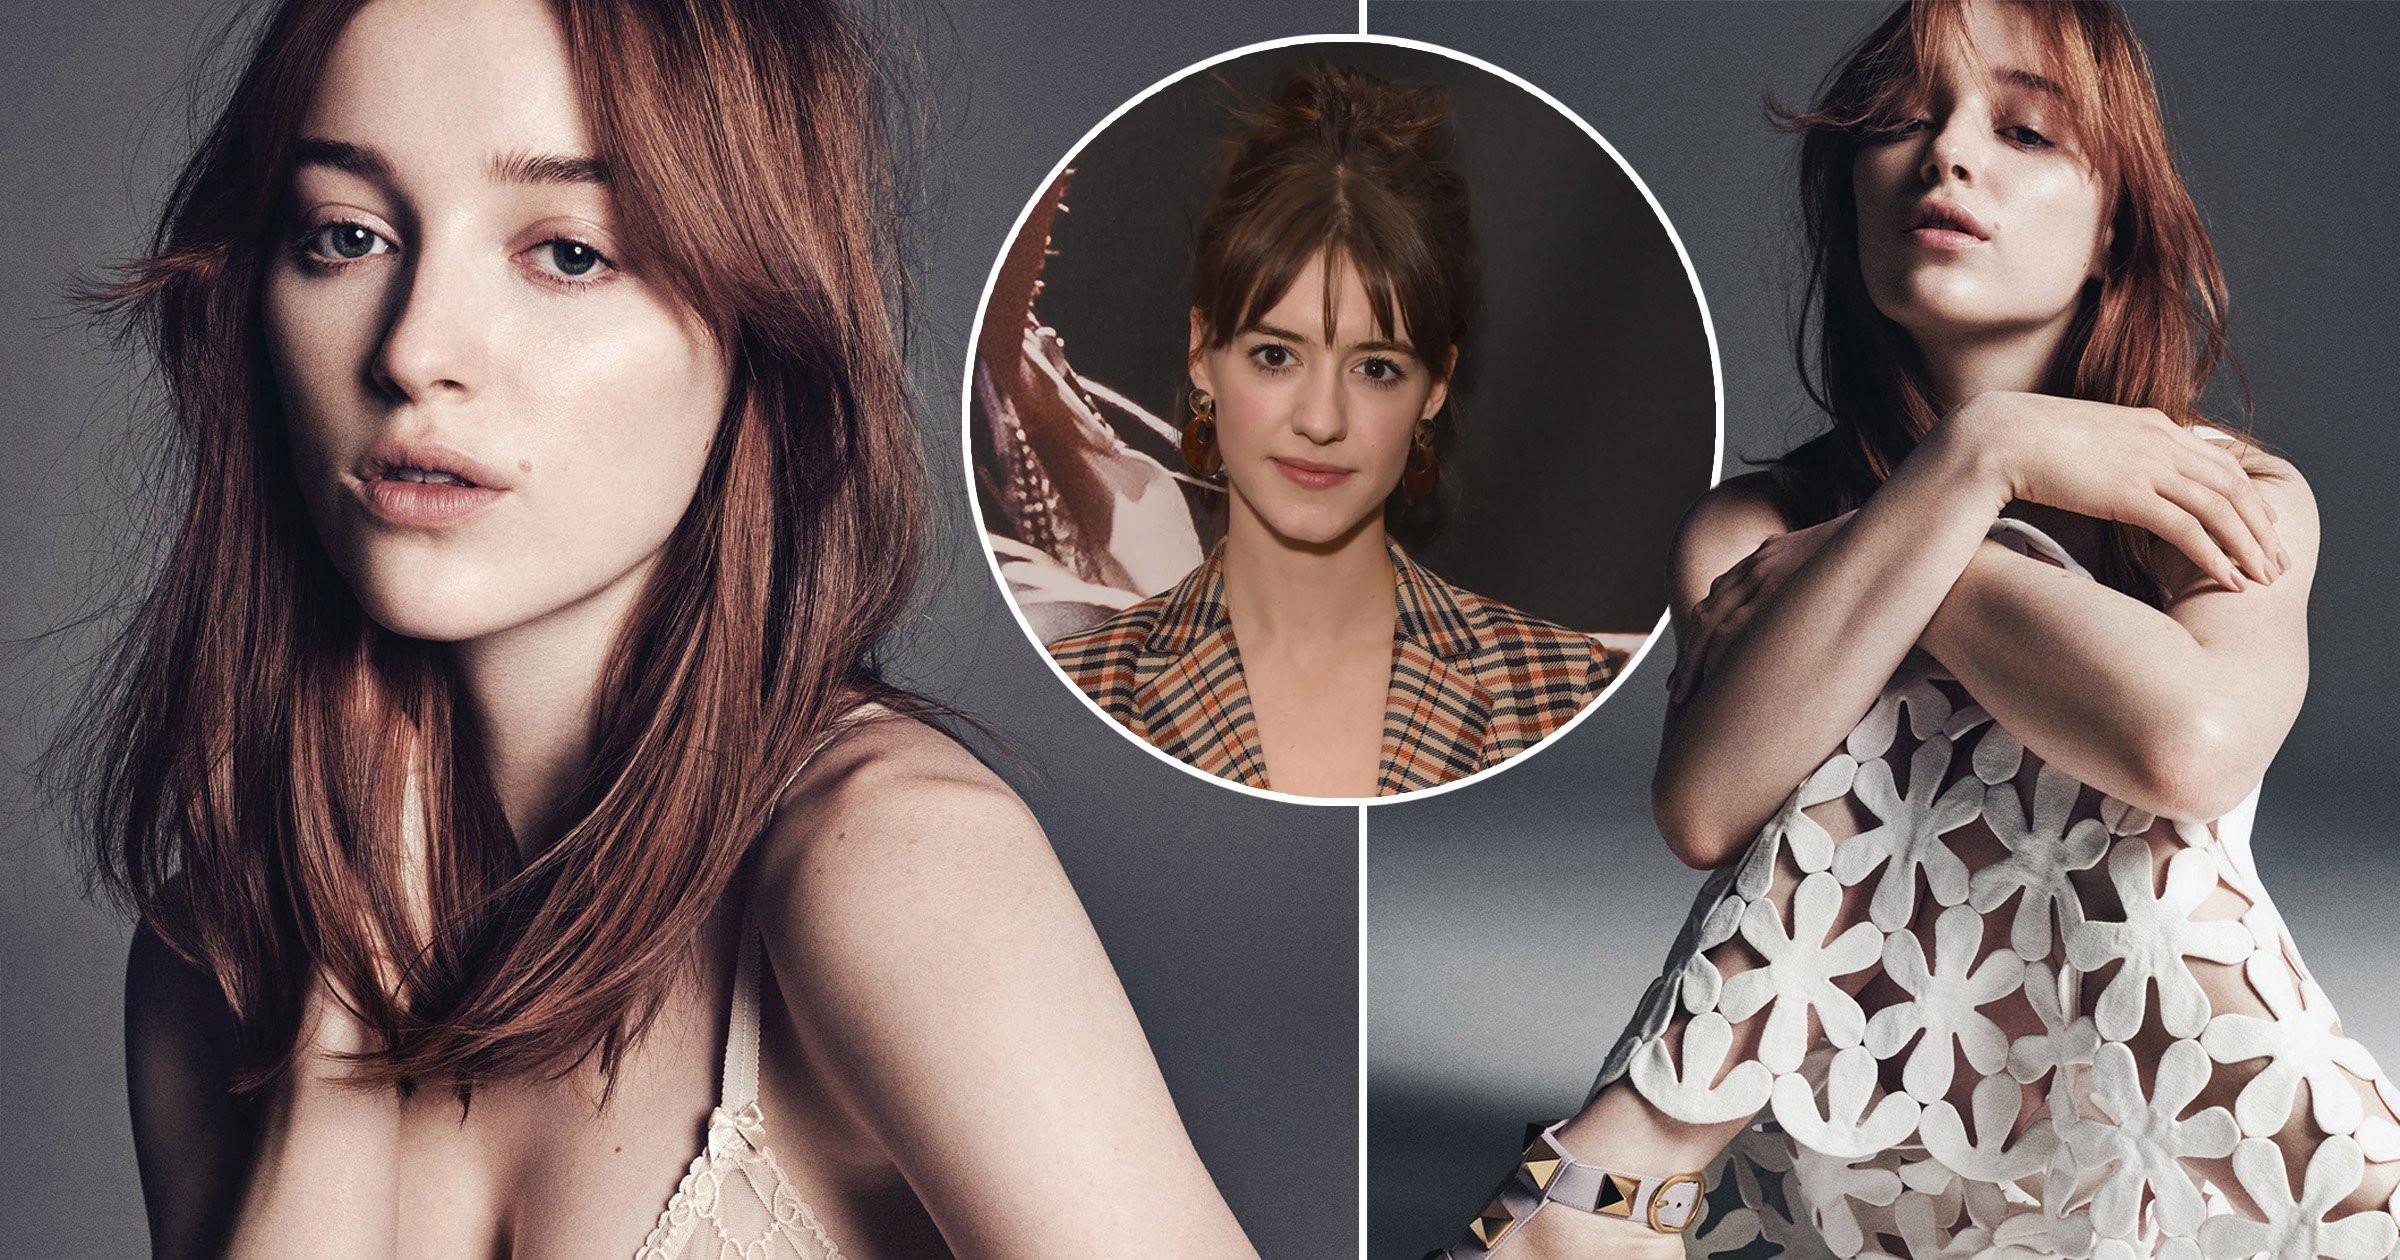 Bridgerton's Phoebe Dynevor reveals sweet call from Normal People's Daisy Edgar-Jones after Netflix hit